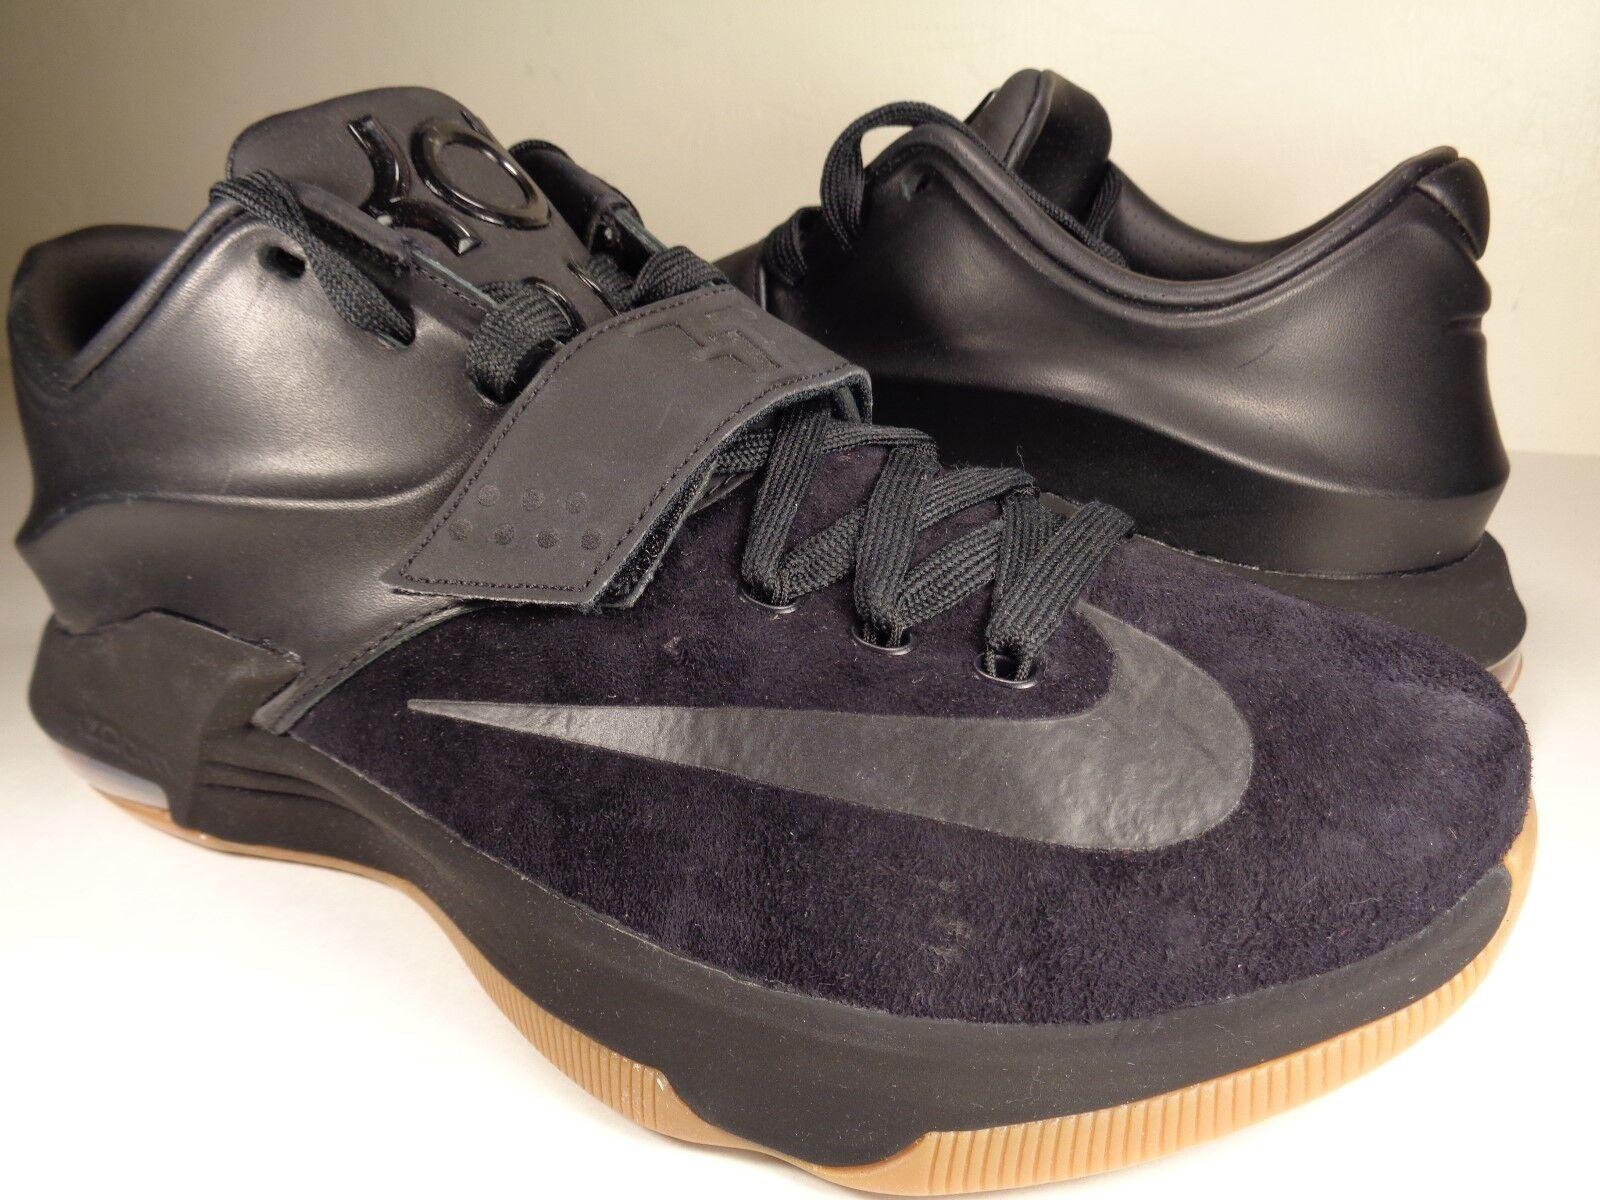 Nike Qs Kd 7 Vii Ext Gamuza Qs Nike Negro Goma Durant (717593001) aac922